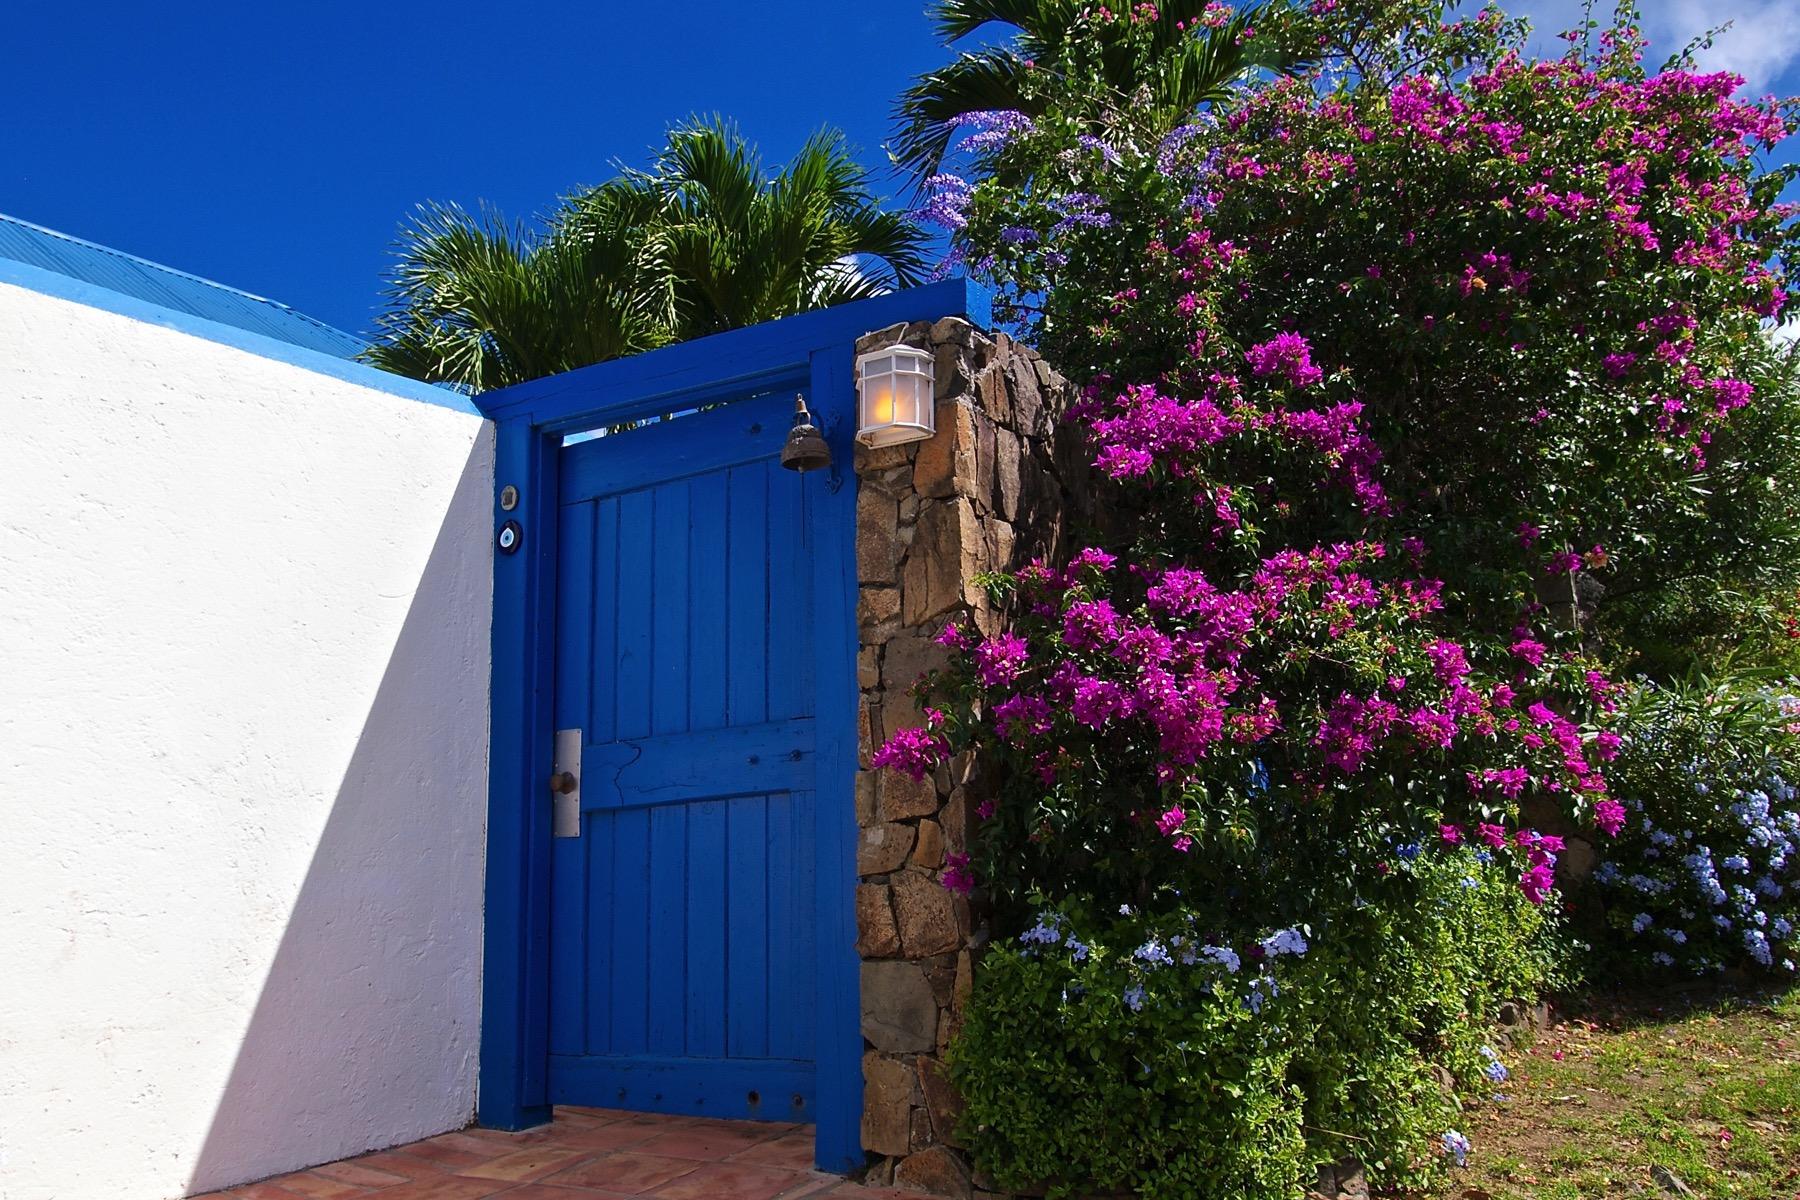 Single Family Home for Sale at Casablanca Other Tortola, Tortola, British Virgin Islands